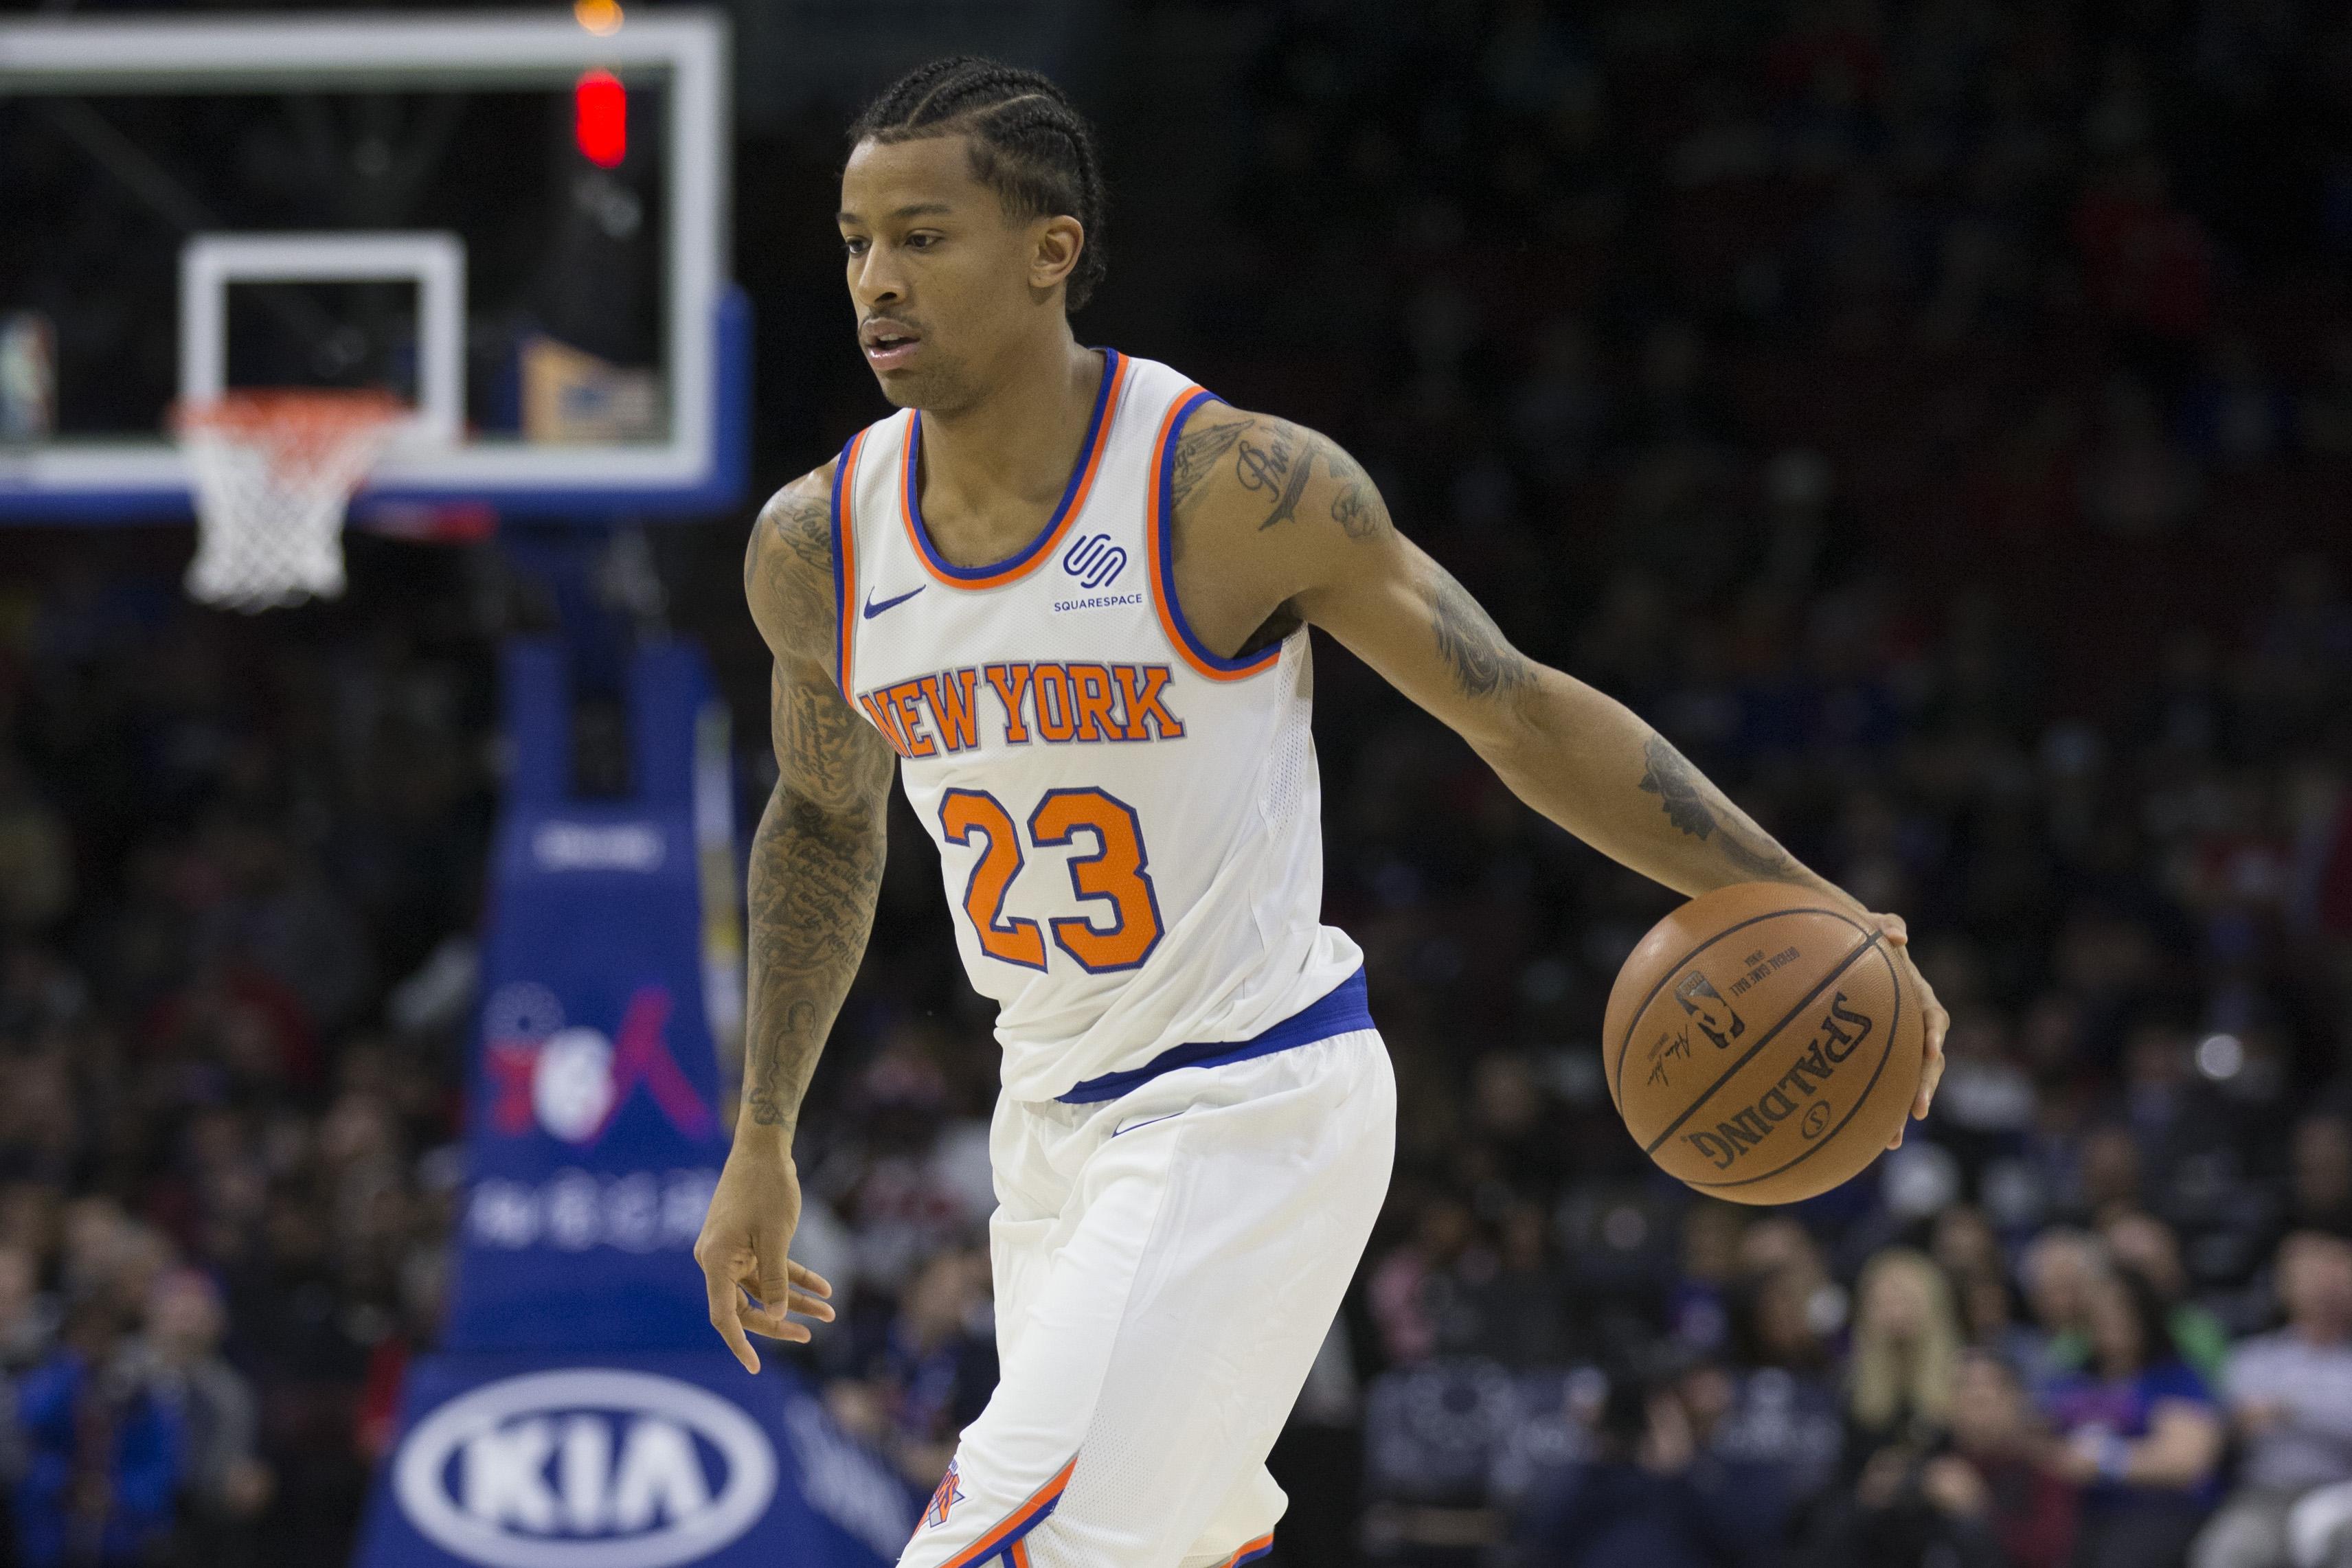 Frank Ntilikina, Emmanuel Mudiay, Trey Burke to see more minutes for Knicks